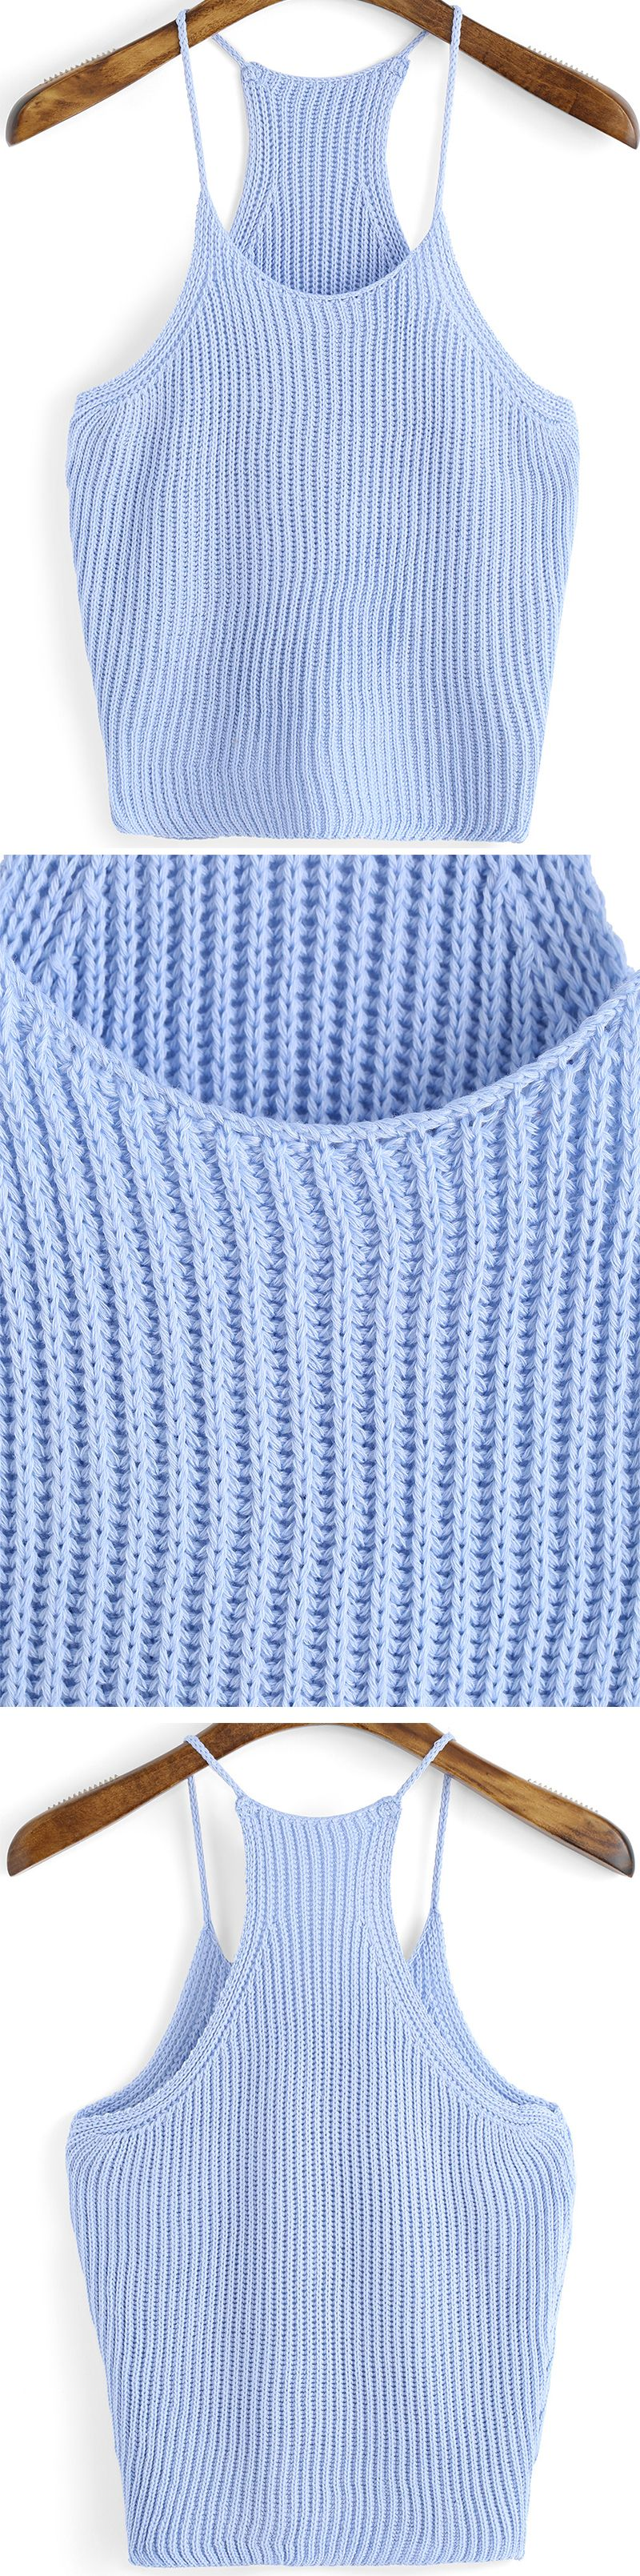 Super Soft Knit Tank Top For Hot Summer. Pretty Light Blue Vest Make A Peace